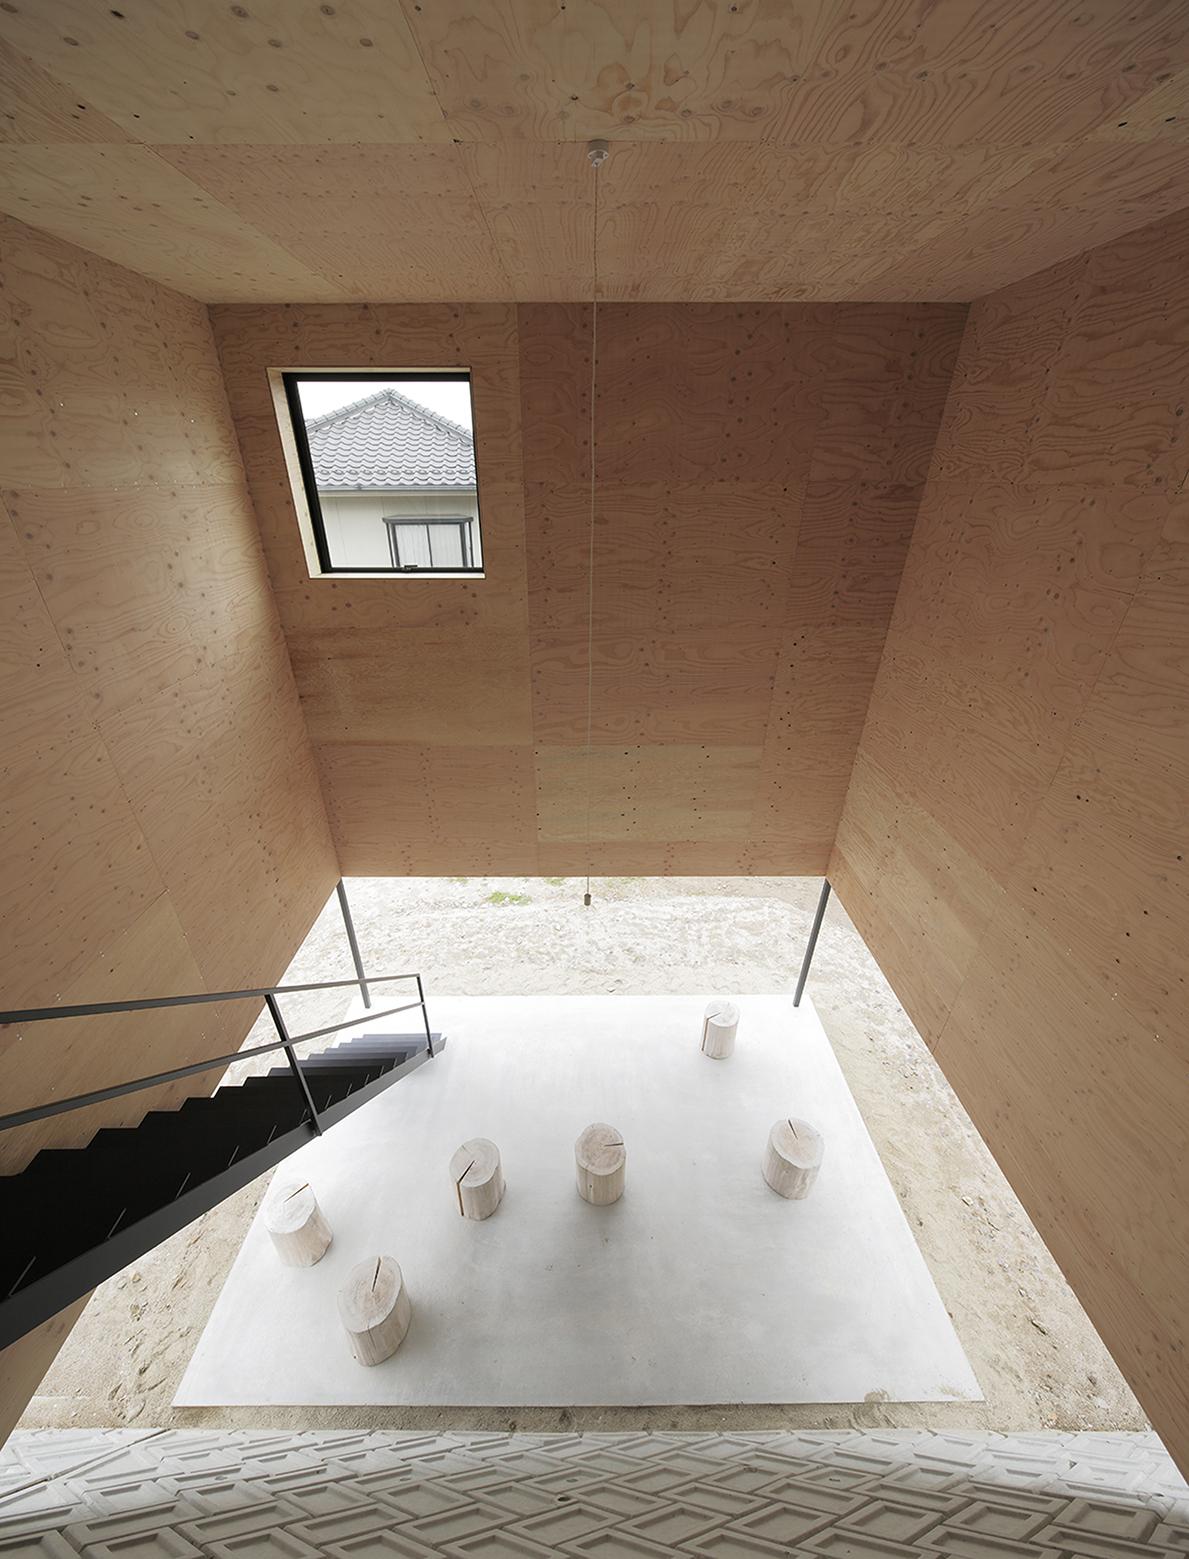 540ea176c07a802ff5000174_house-in-miyake-hidetaka-nakahara-architects-yoshio-ohno-architects_oono_miyake_140407_029